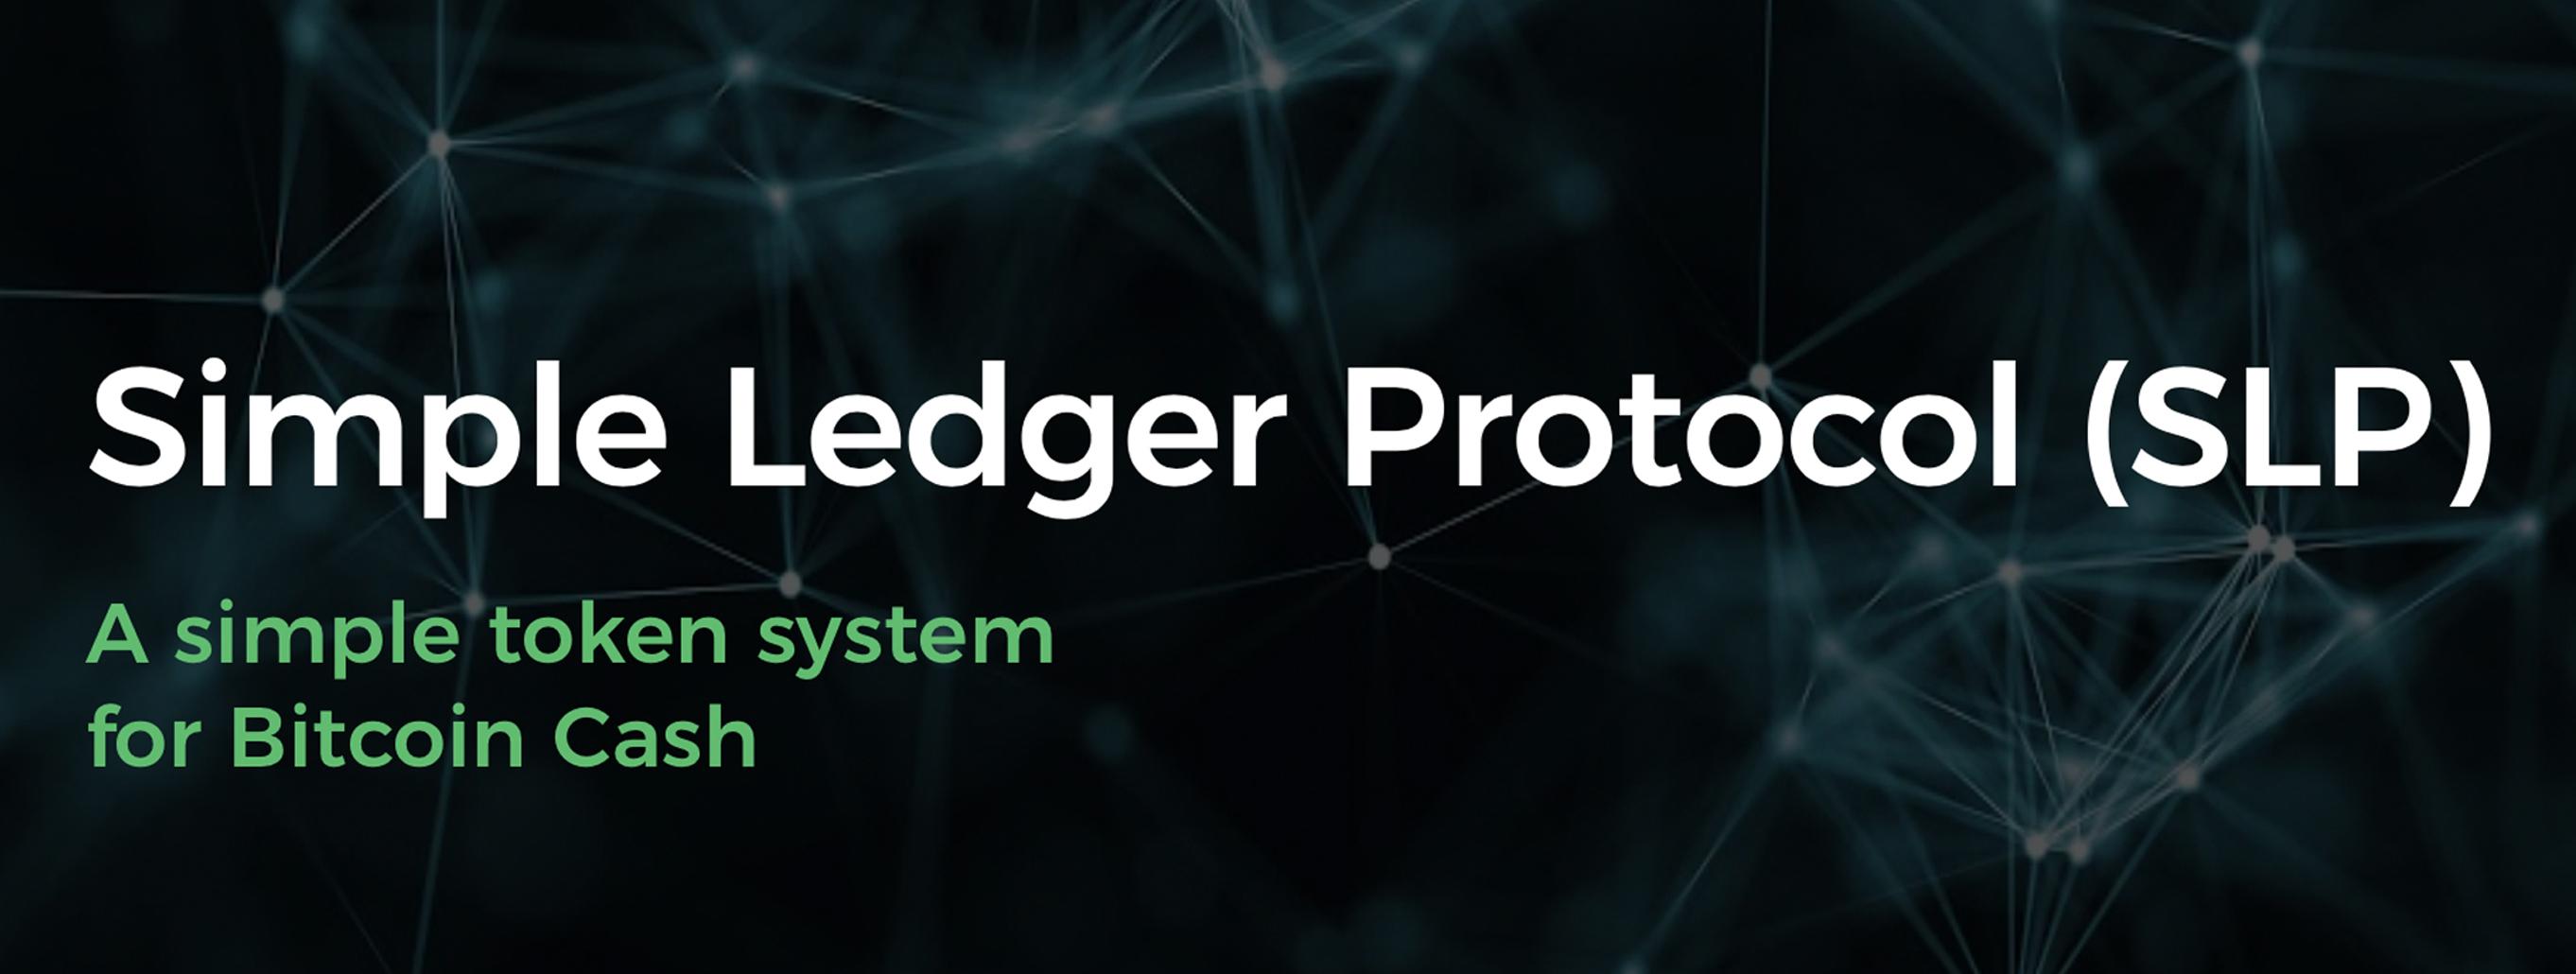 SLP Token Environment Built on Bitcoin Cash Continues to Expand